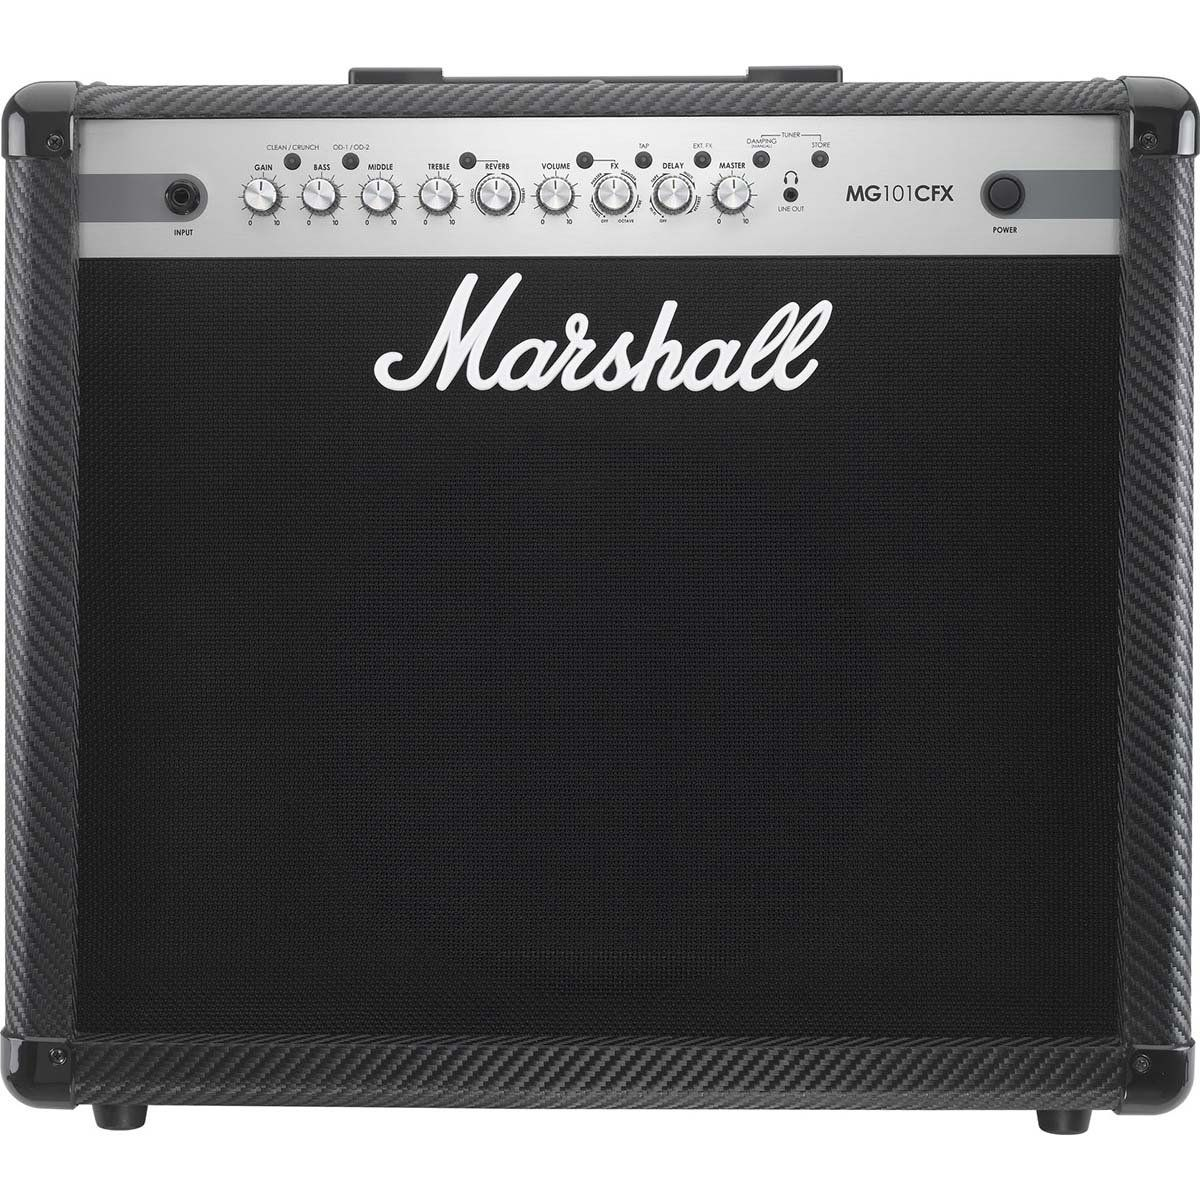 Marshall MG101CFX Amplificador Combo para Guitarra 100w de Potência